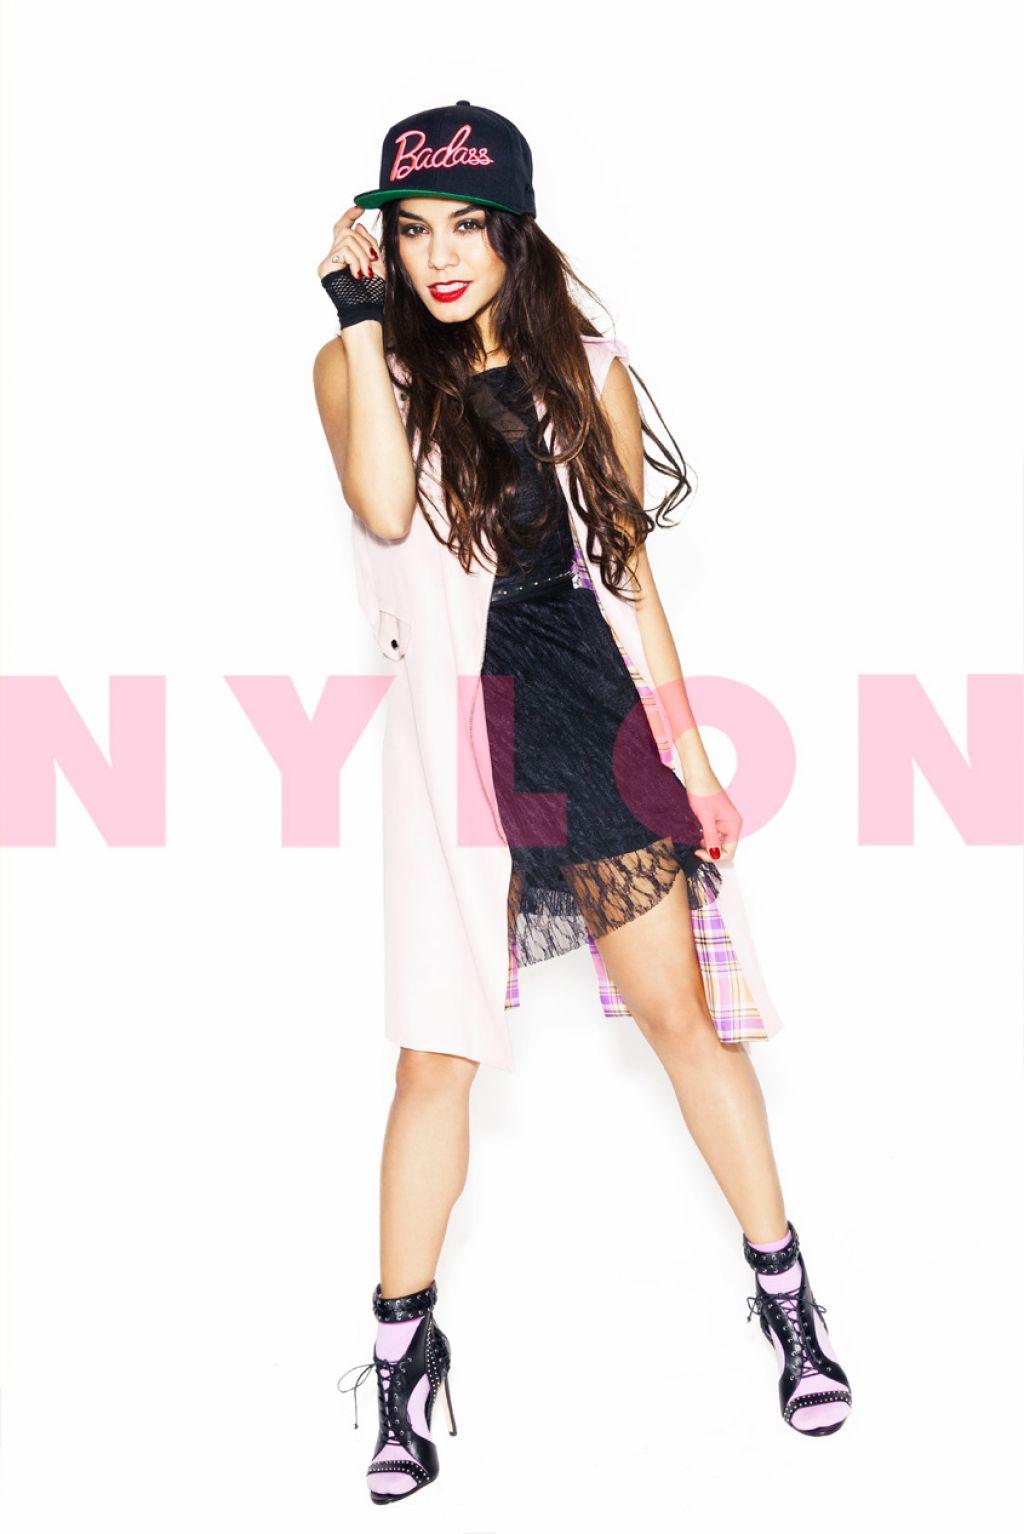 Nylon Noticias 60